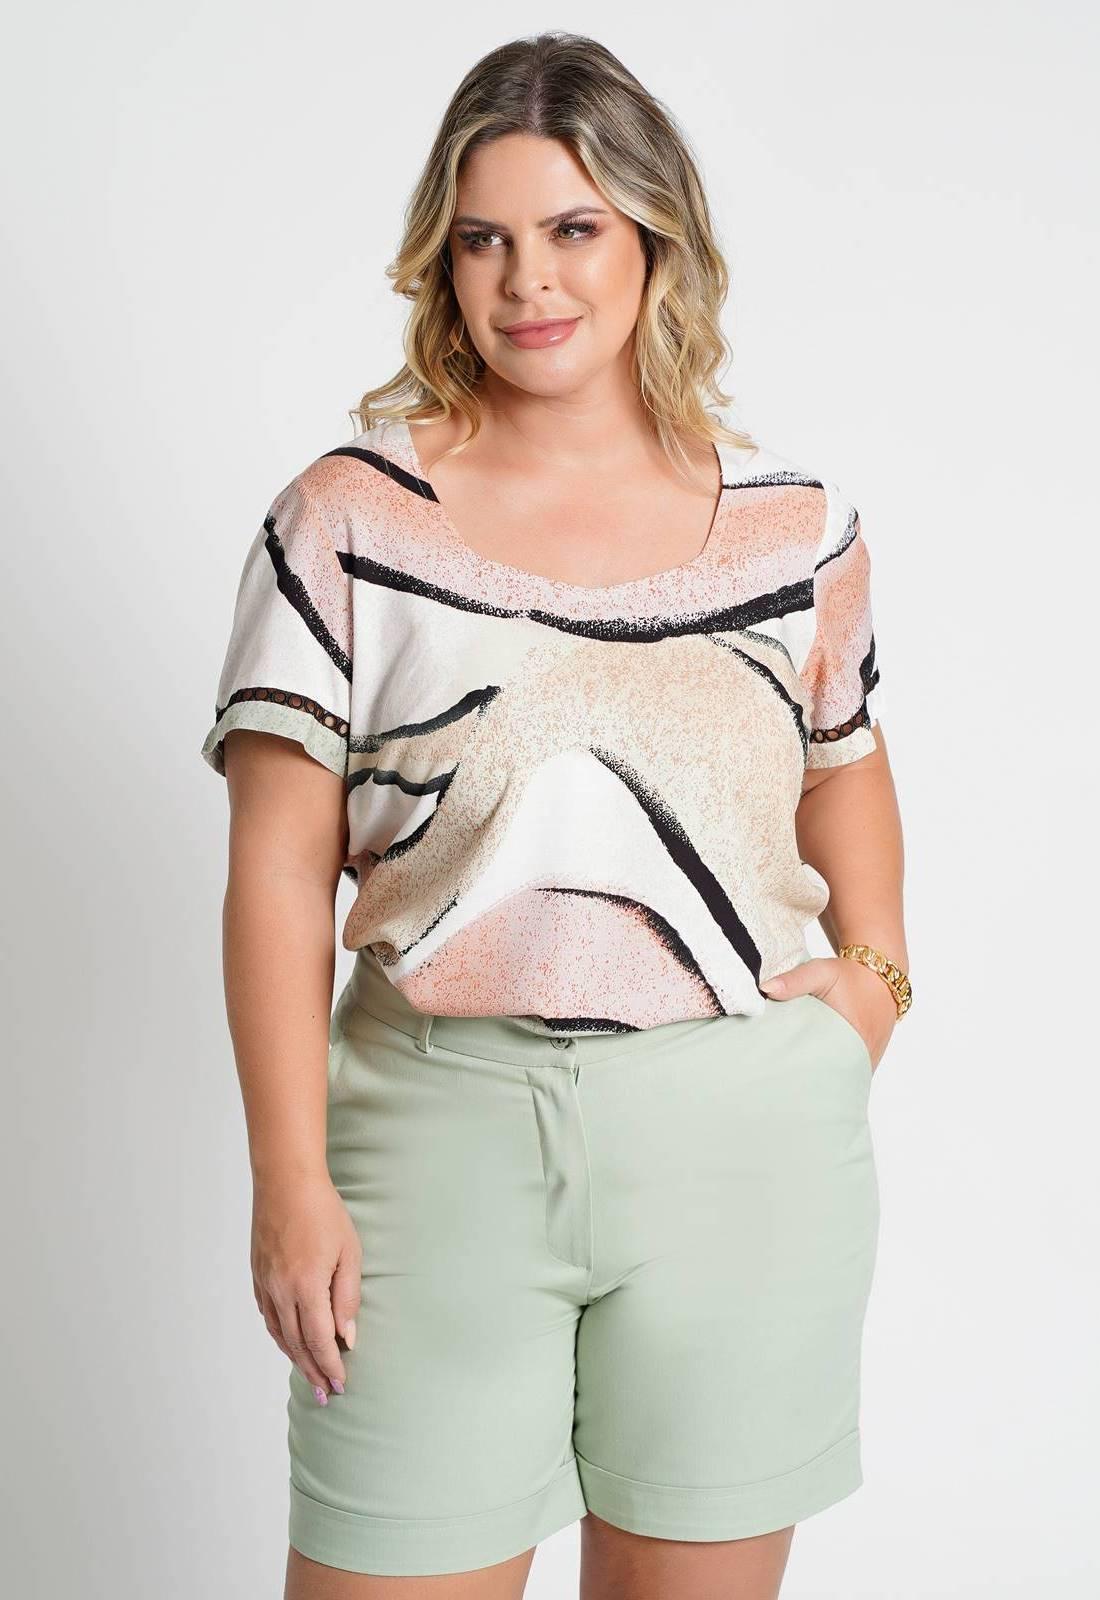 Blusa estampada com renda manga Bege Ref. U76021